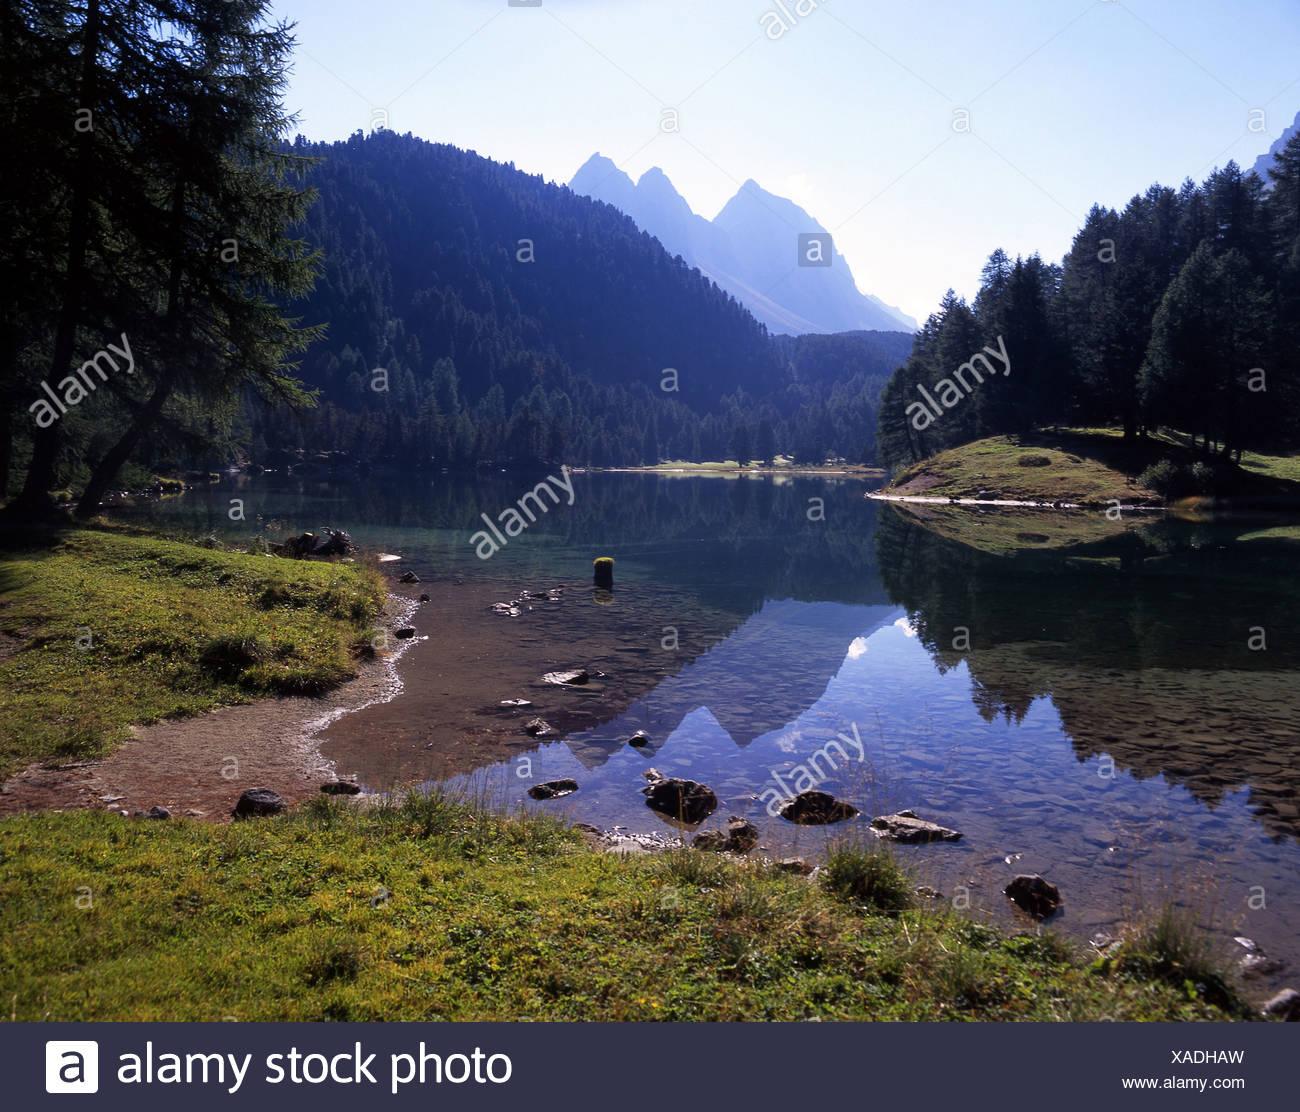 Mountain lake Lai da Palpuogna lake scenery landscape mountains Alps Albula Albulapass pass Grisons Graubun - Stock Image